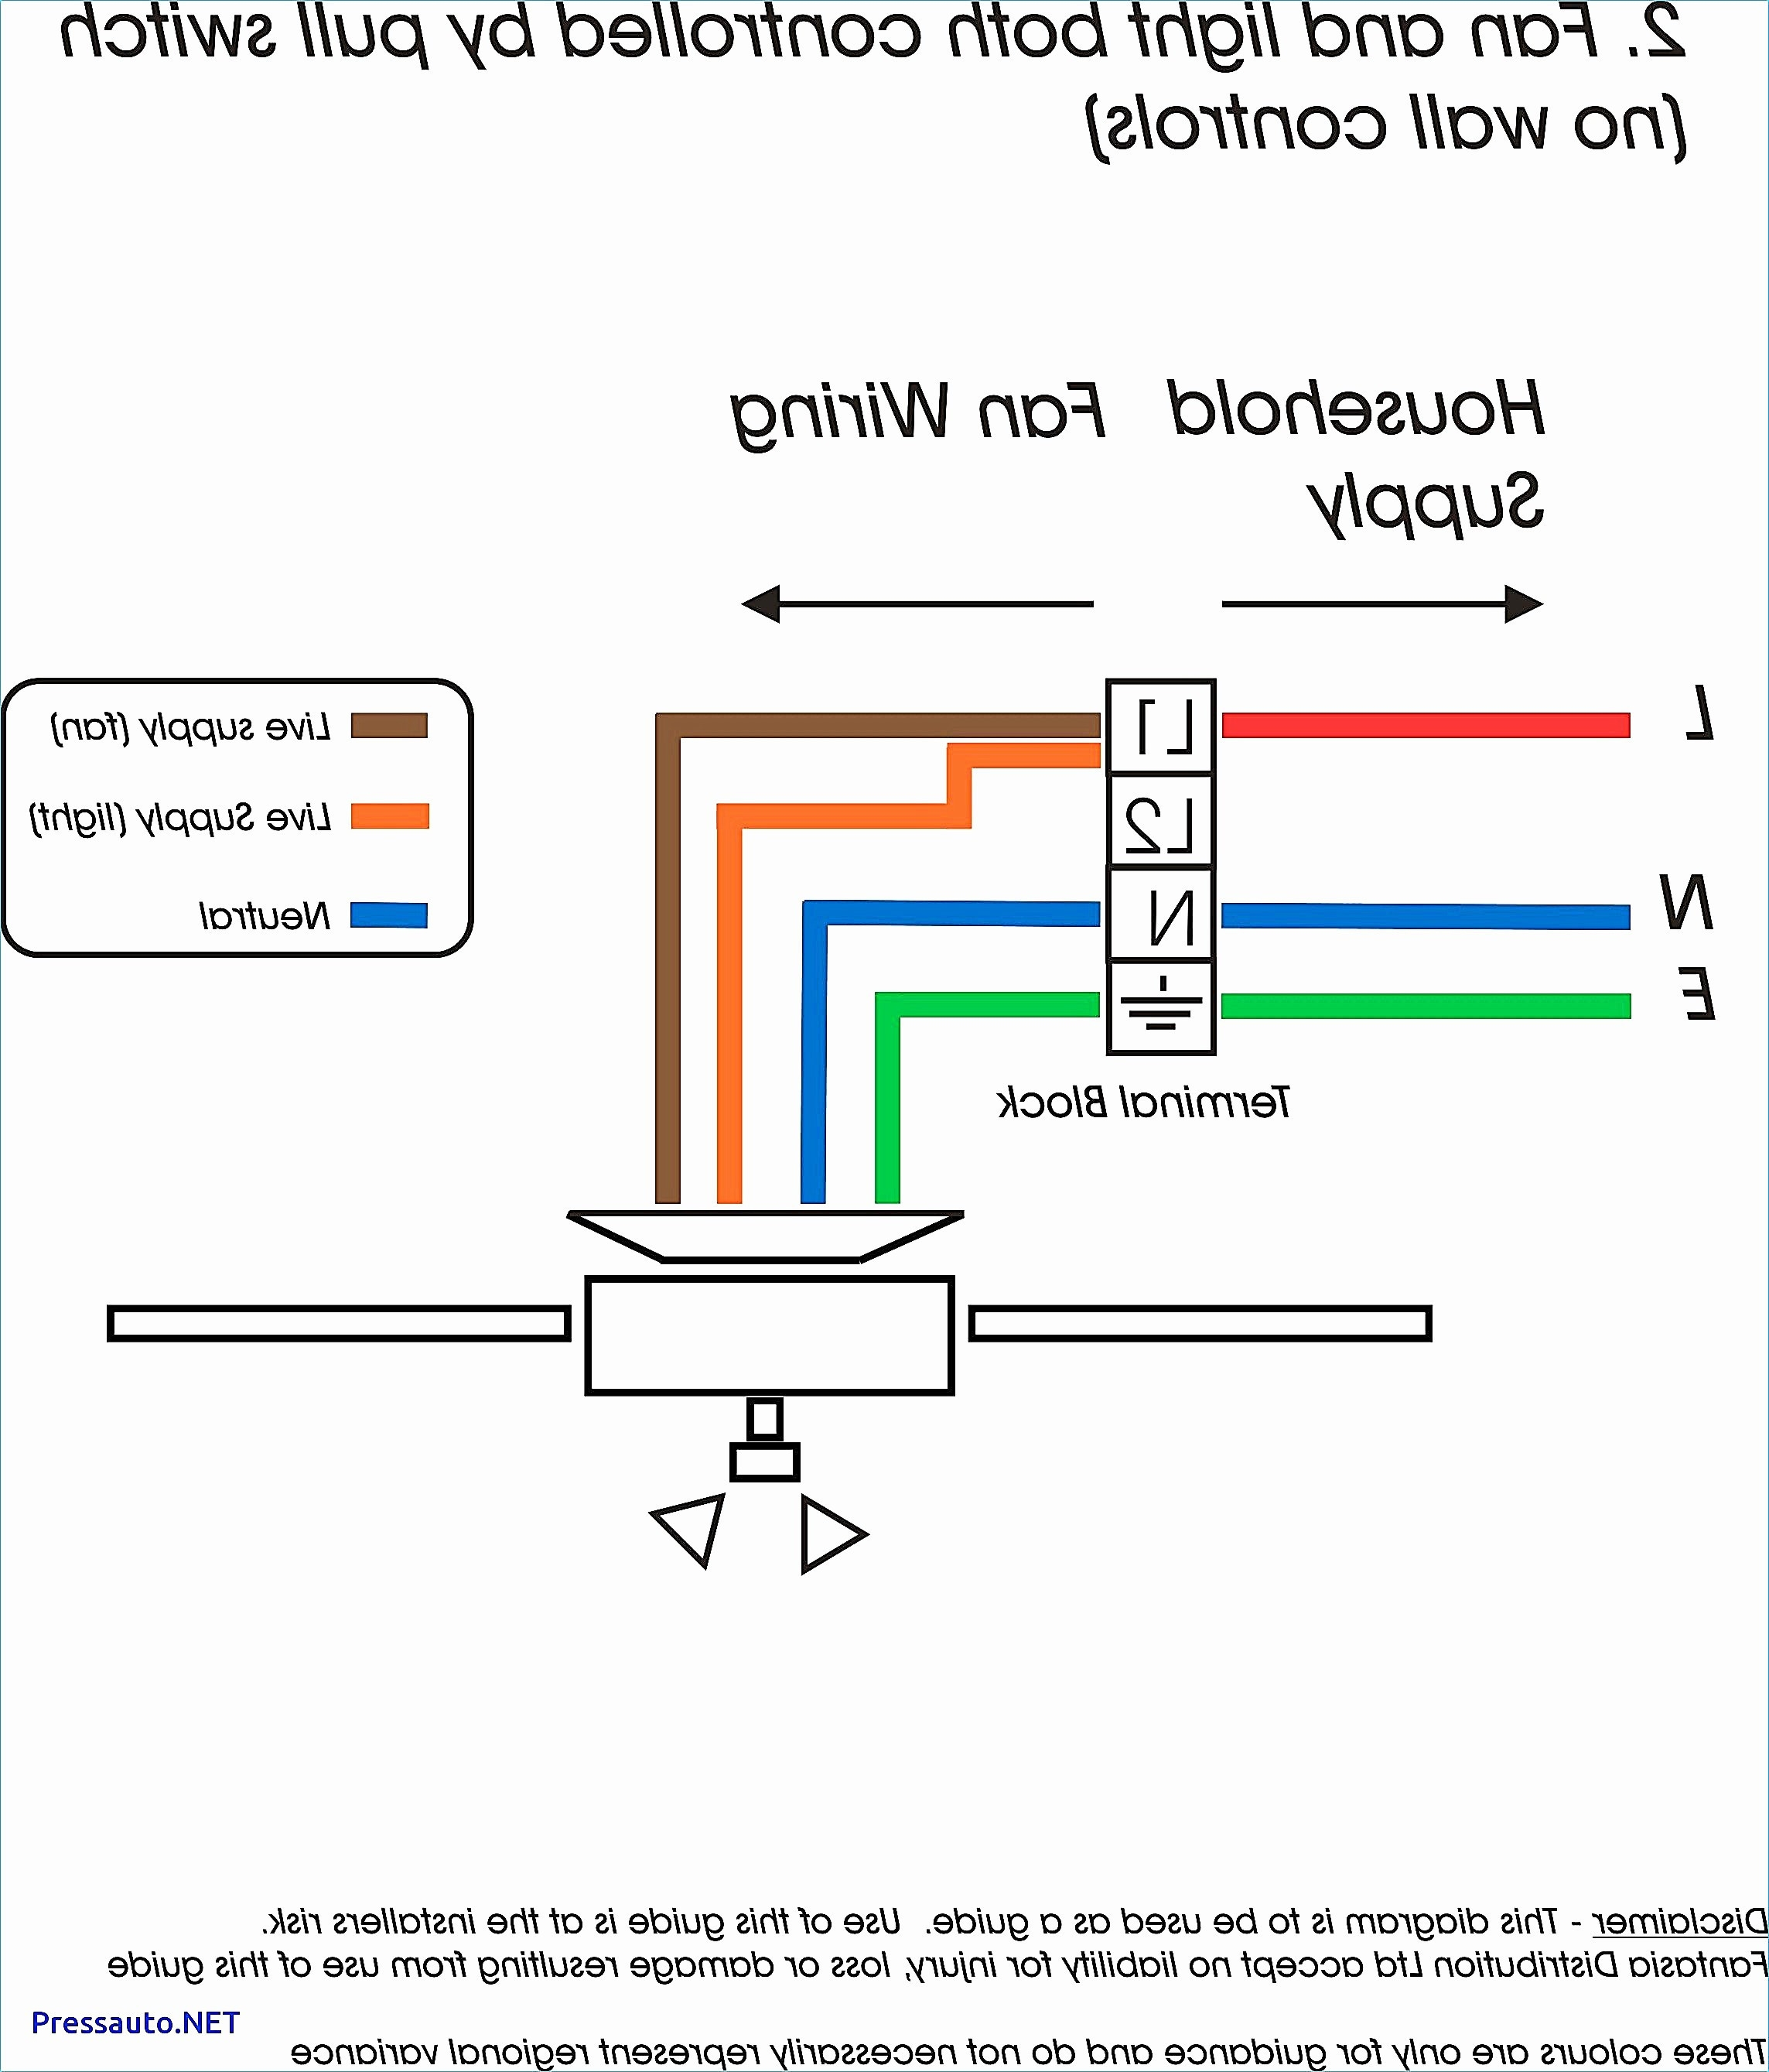 Wiring Diagram Symbols For Heaters Free Download Lanair Waste Oil Heater Wiring Diagram Free Wiring Diagram